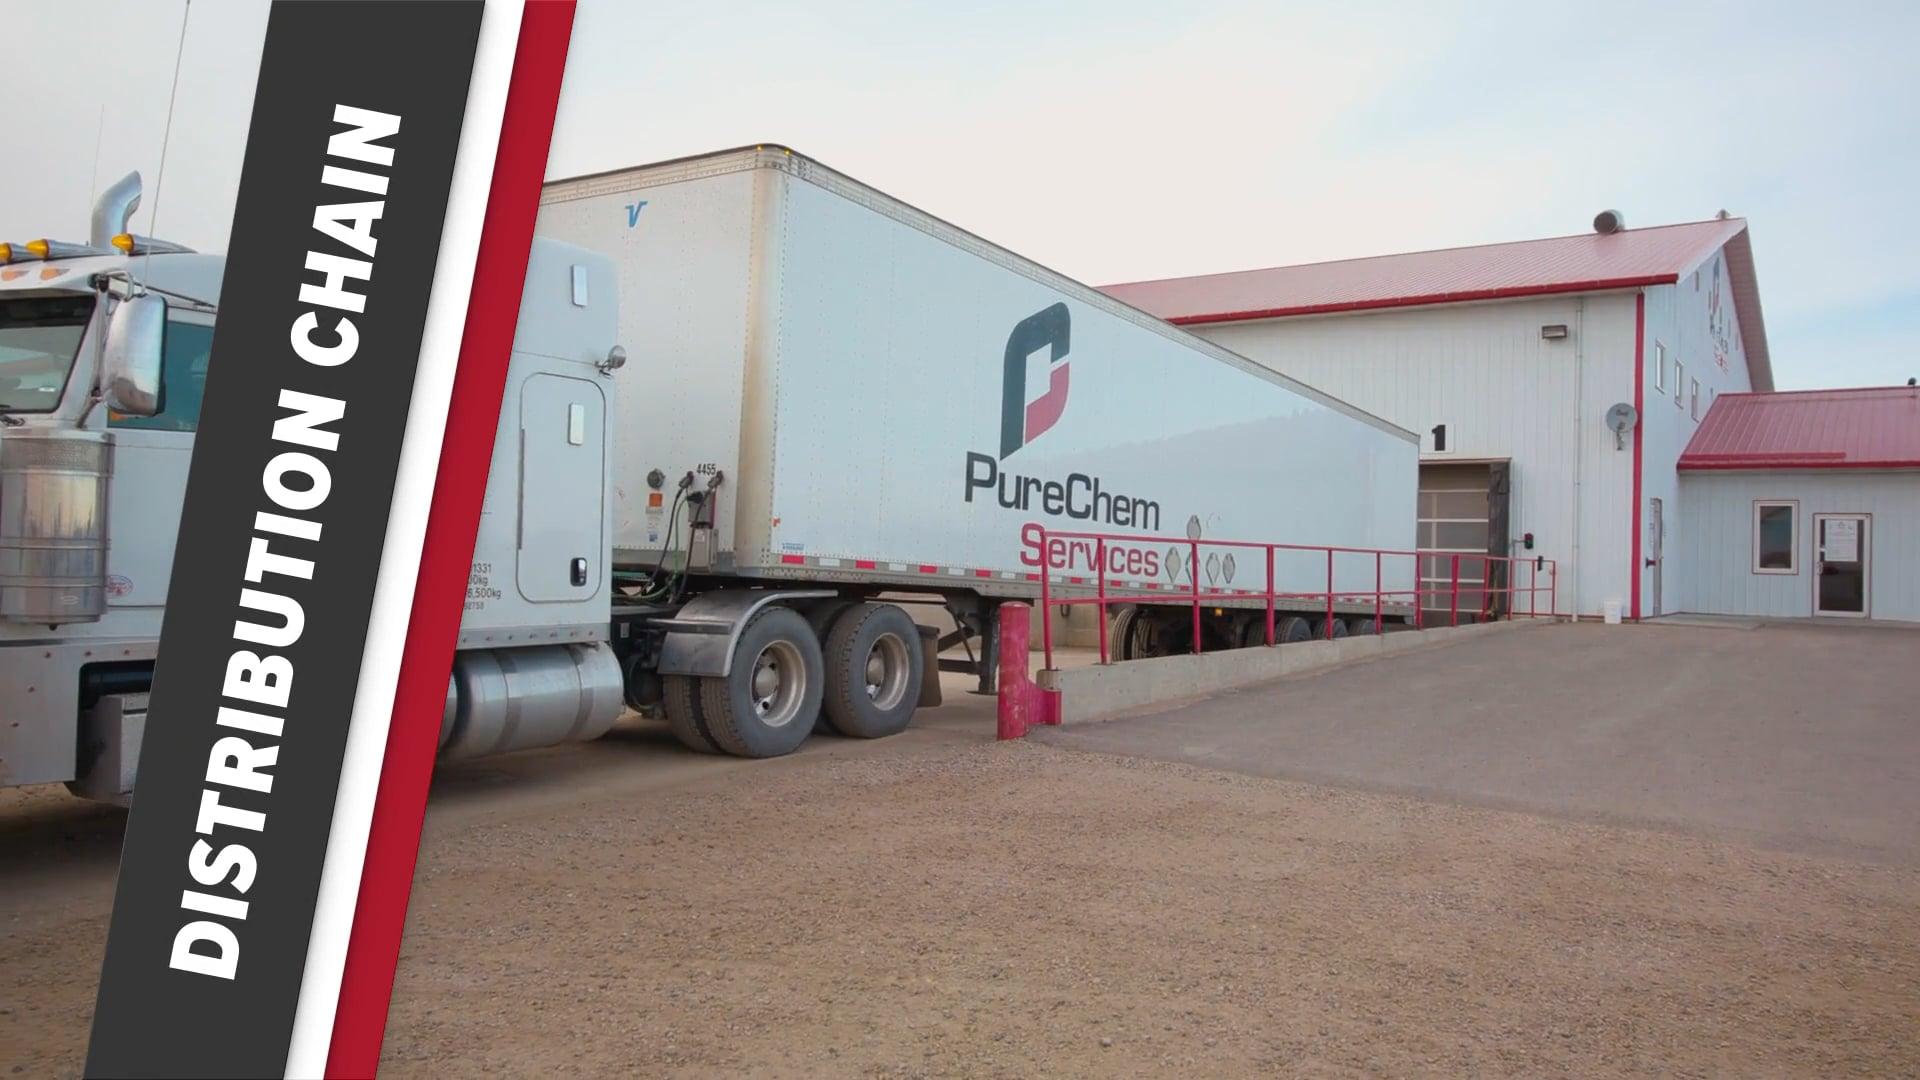 PureChem Services